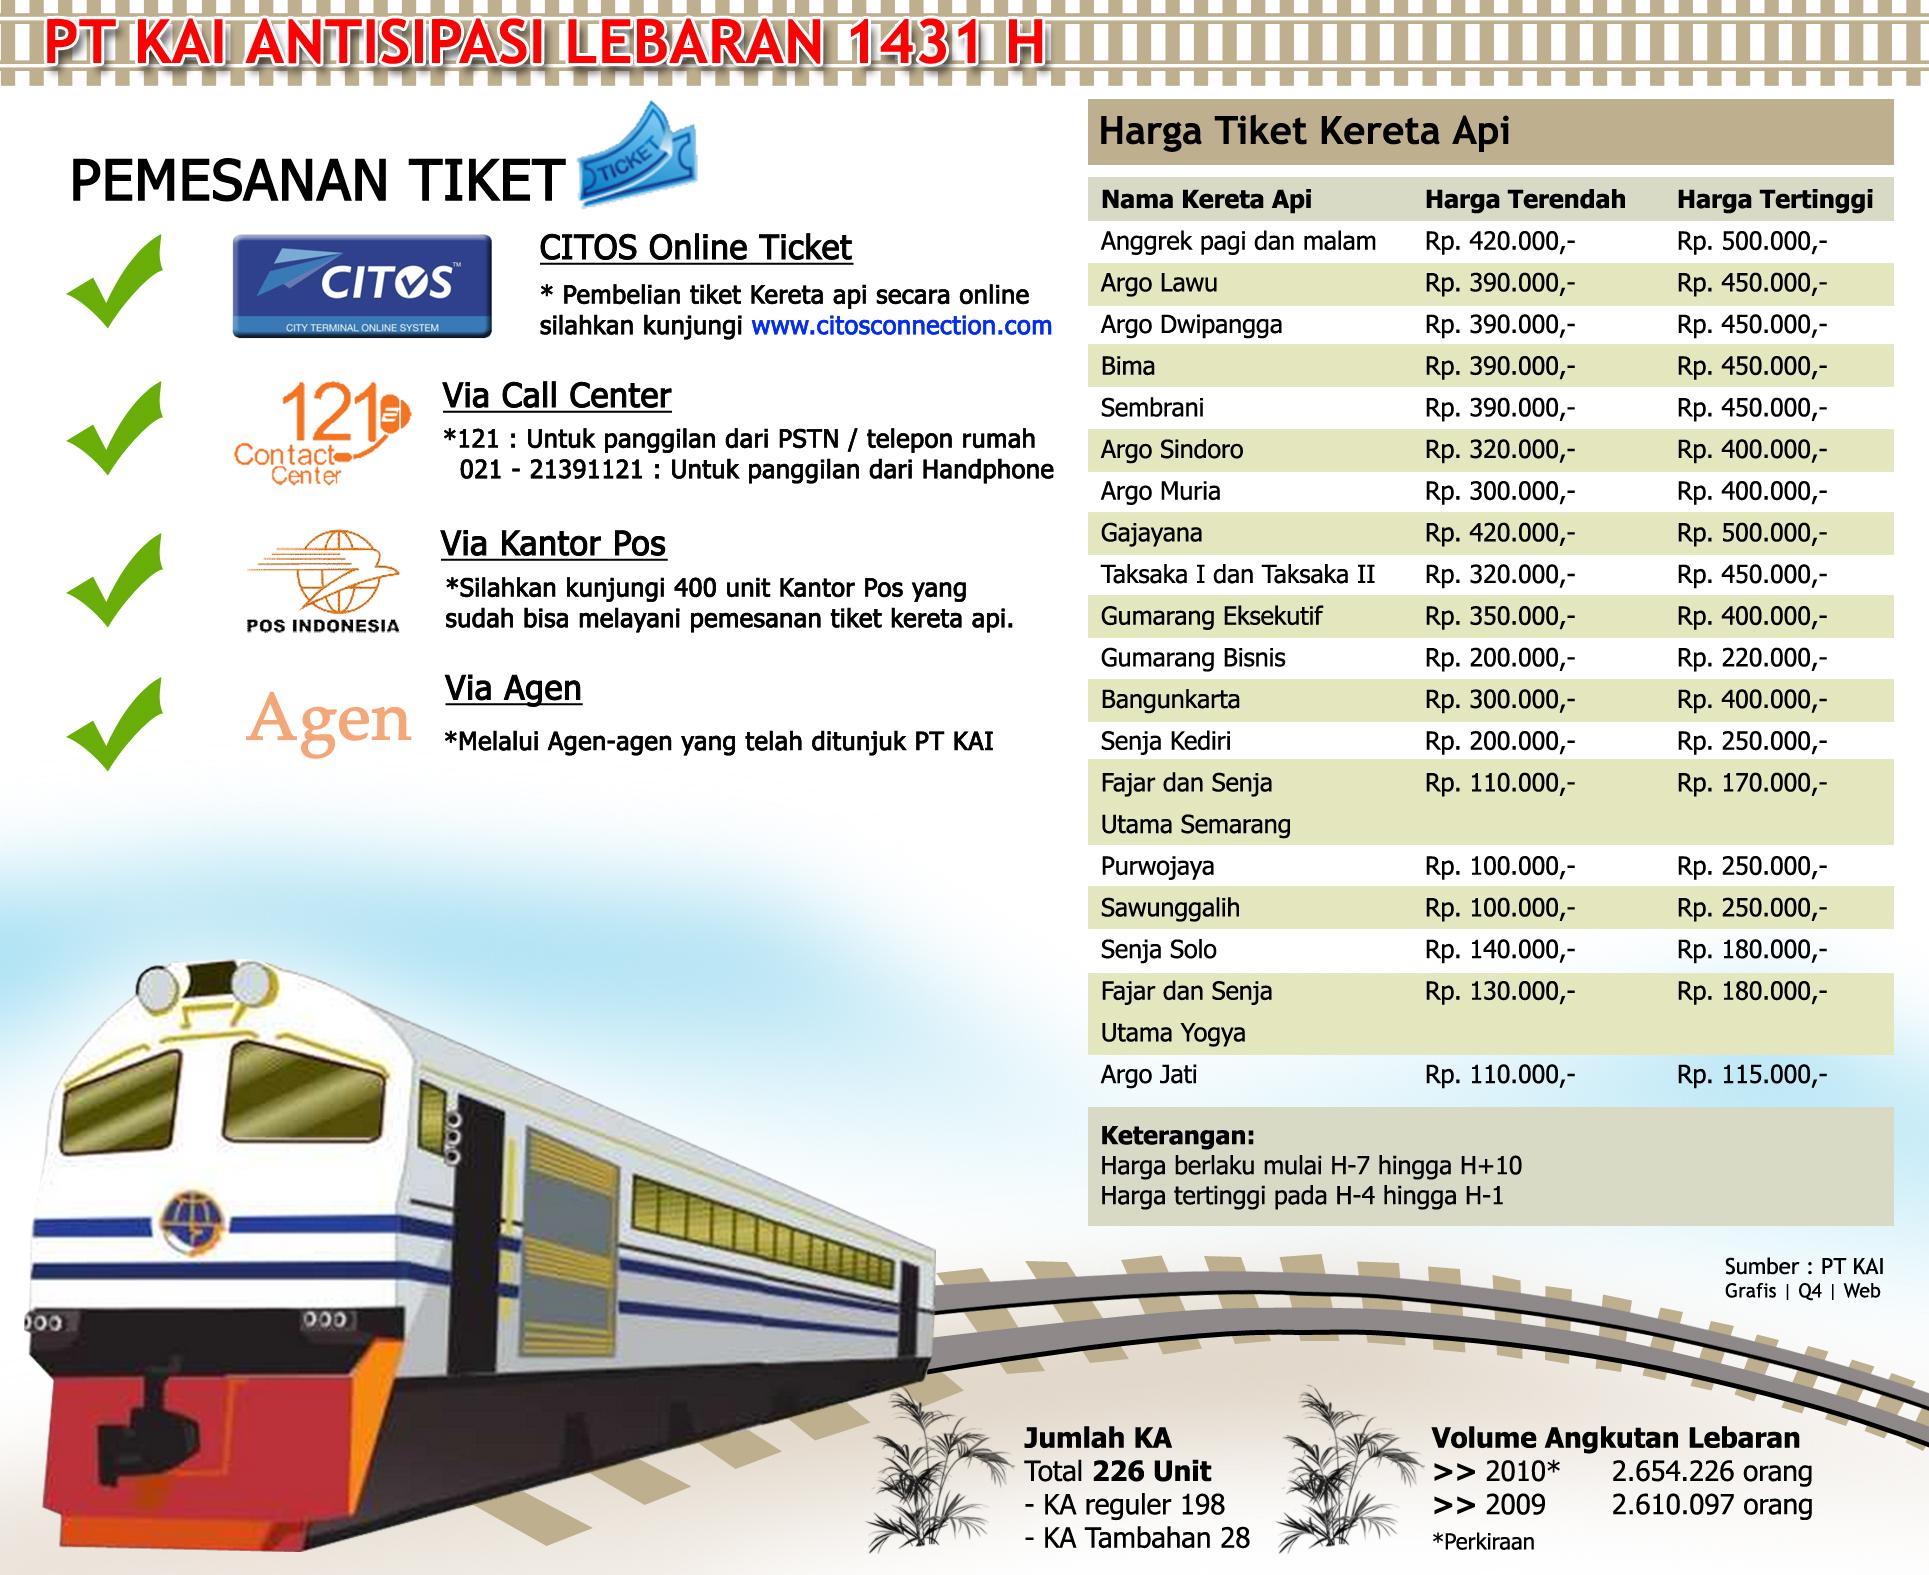 Harga Tiket Kereta Api Jelang Lebaran 2010